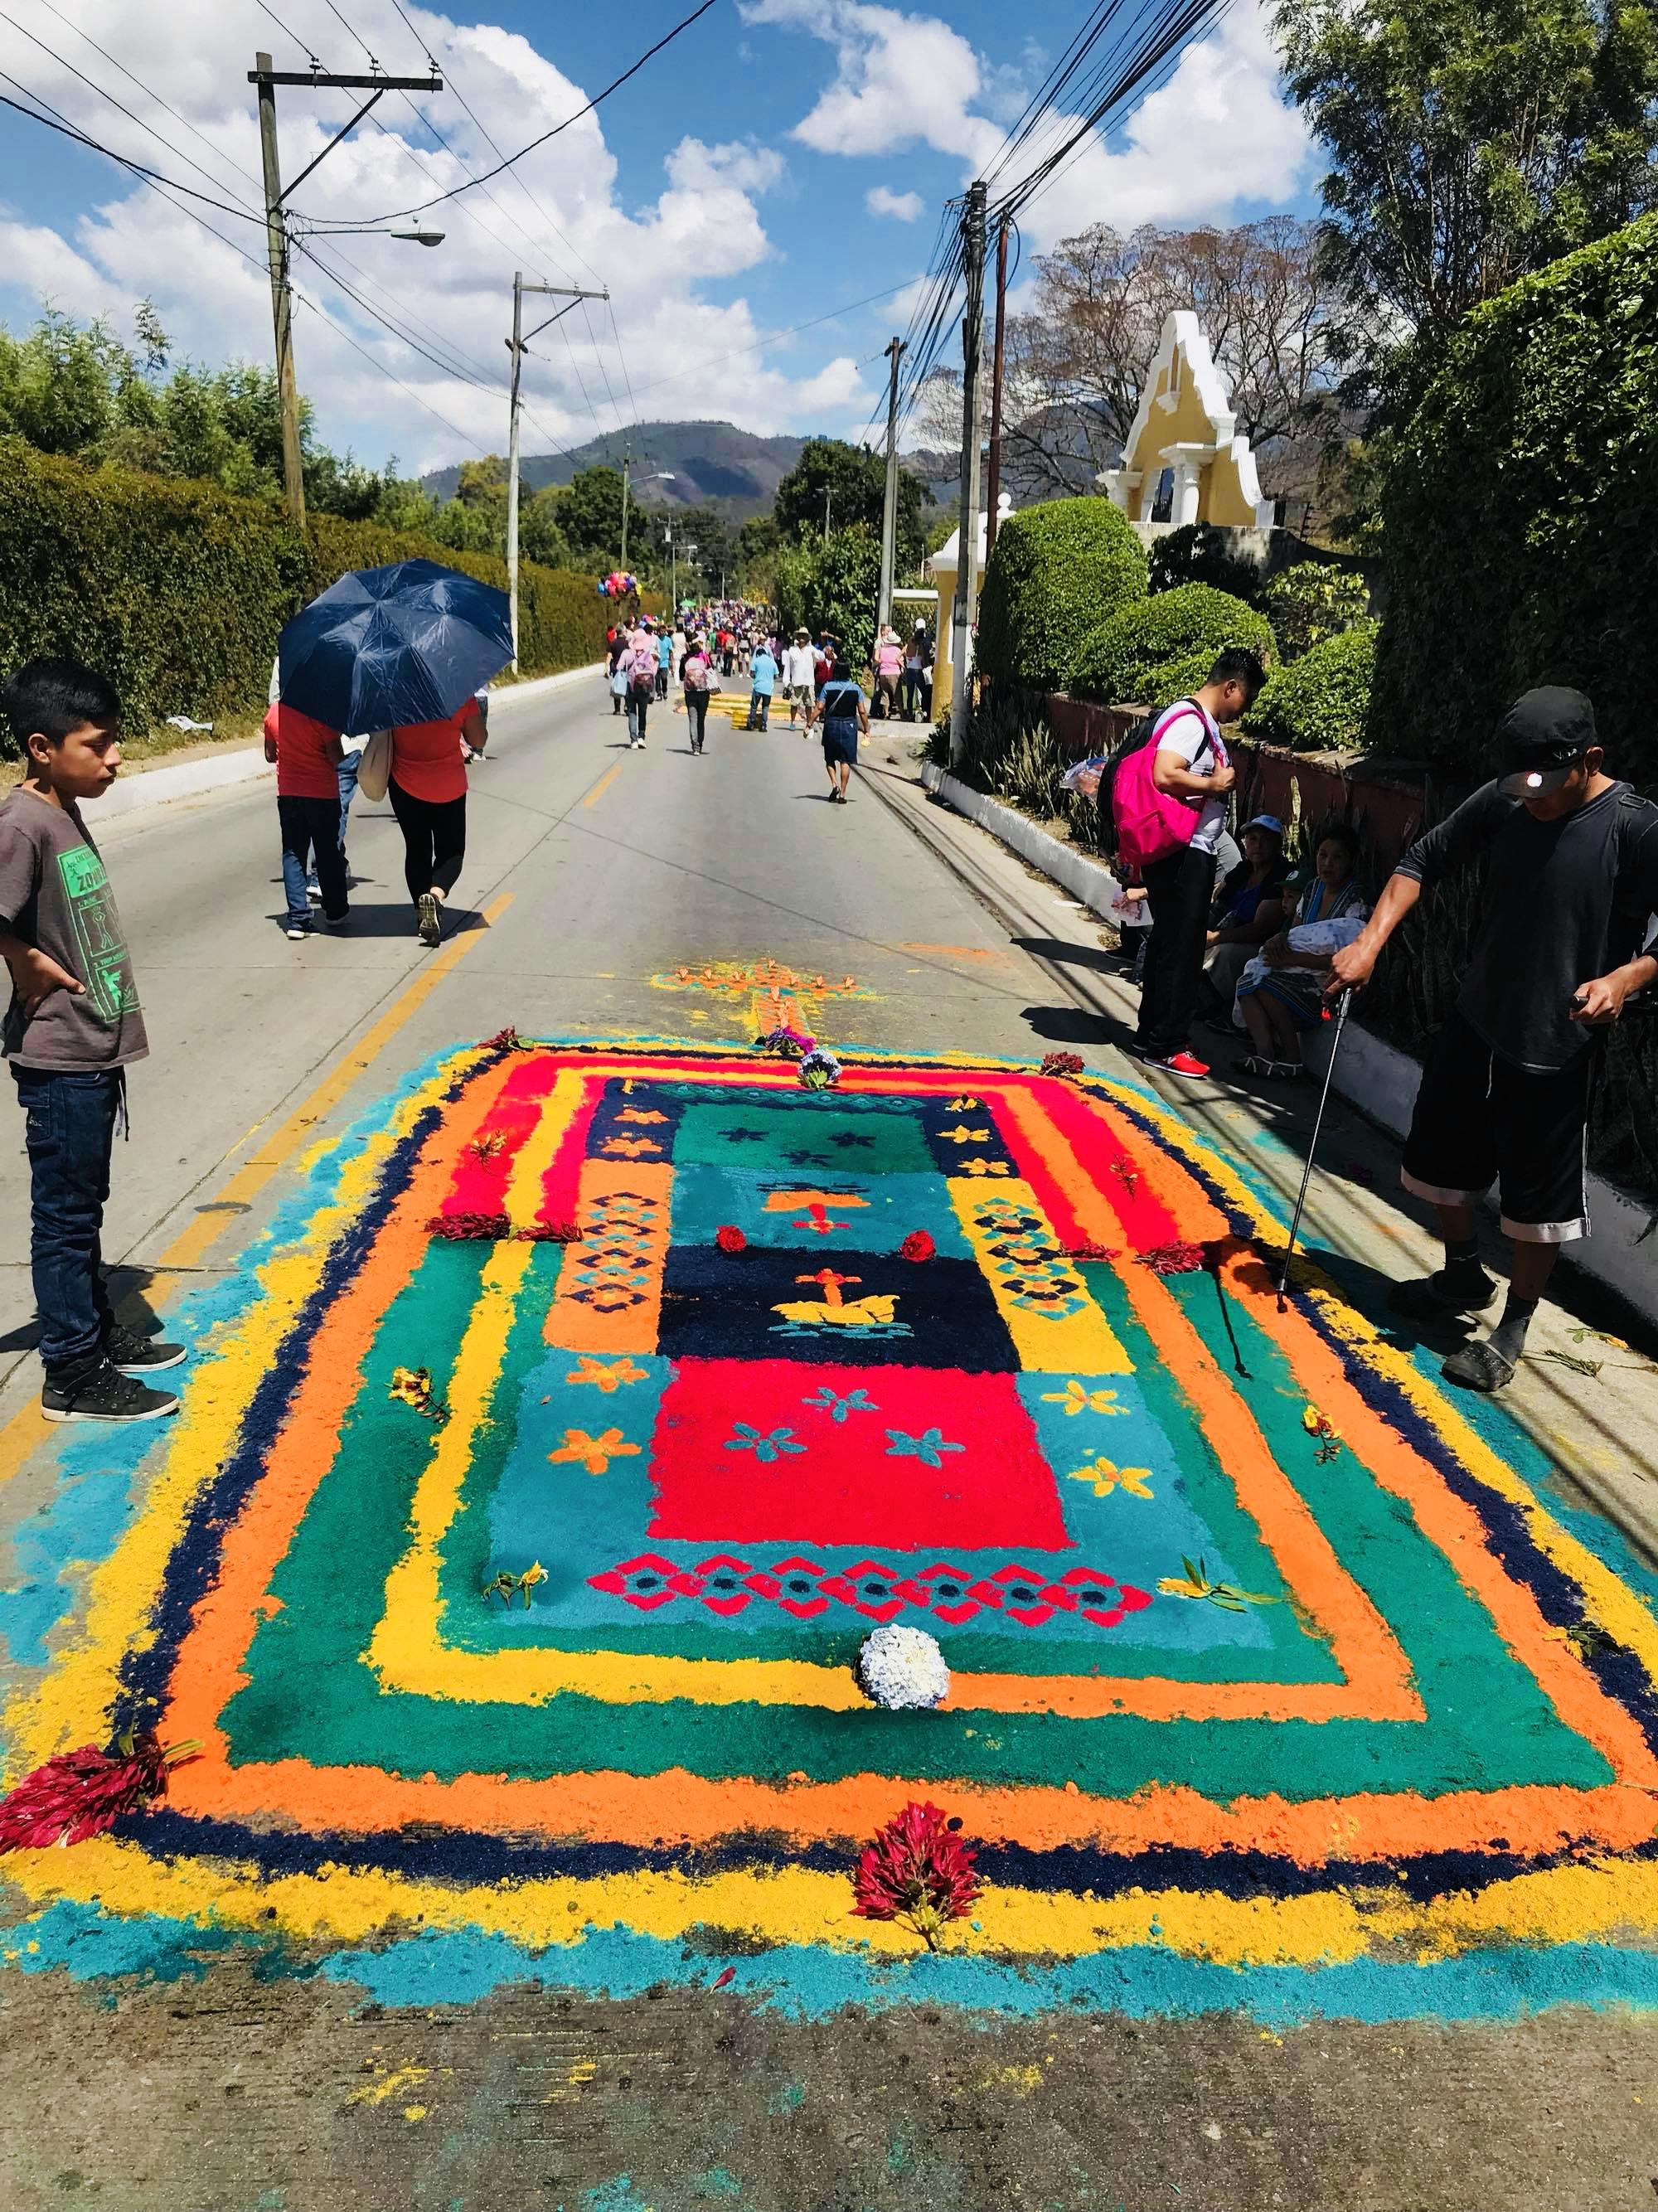 Enjoying the local traditions in Antigua, Guatemala.